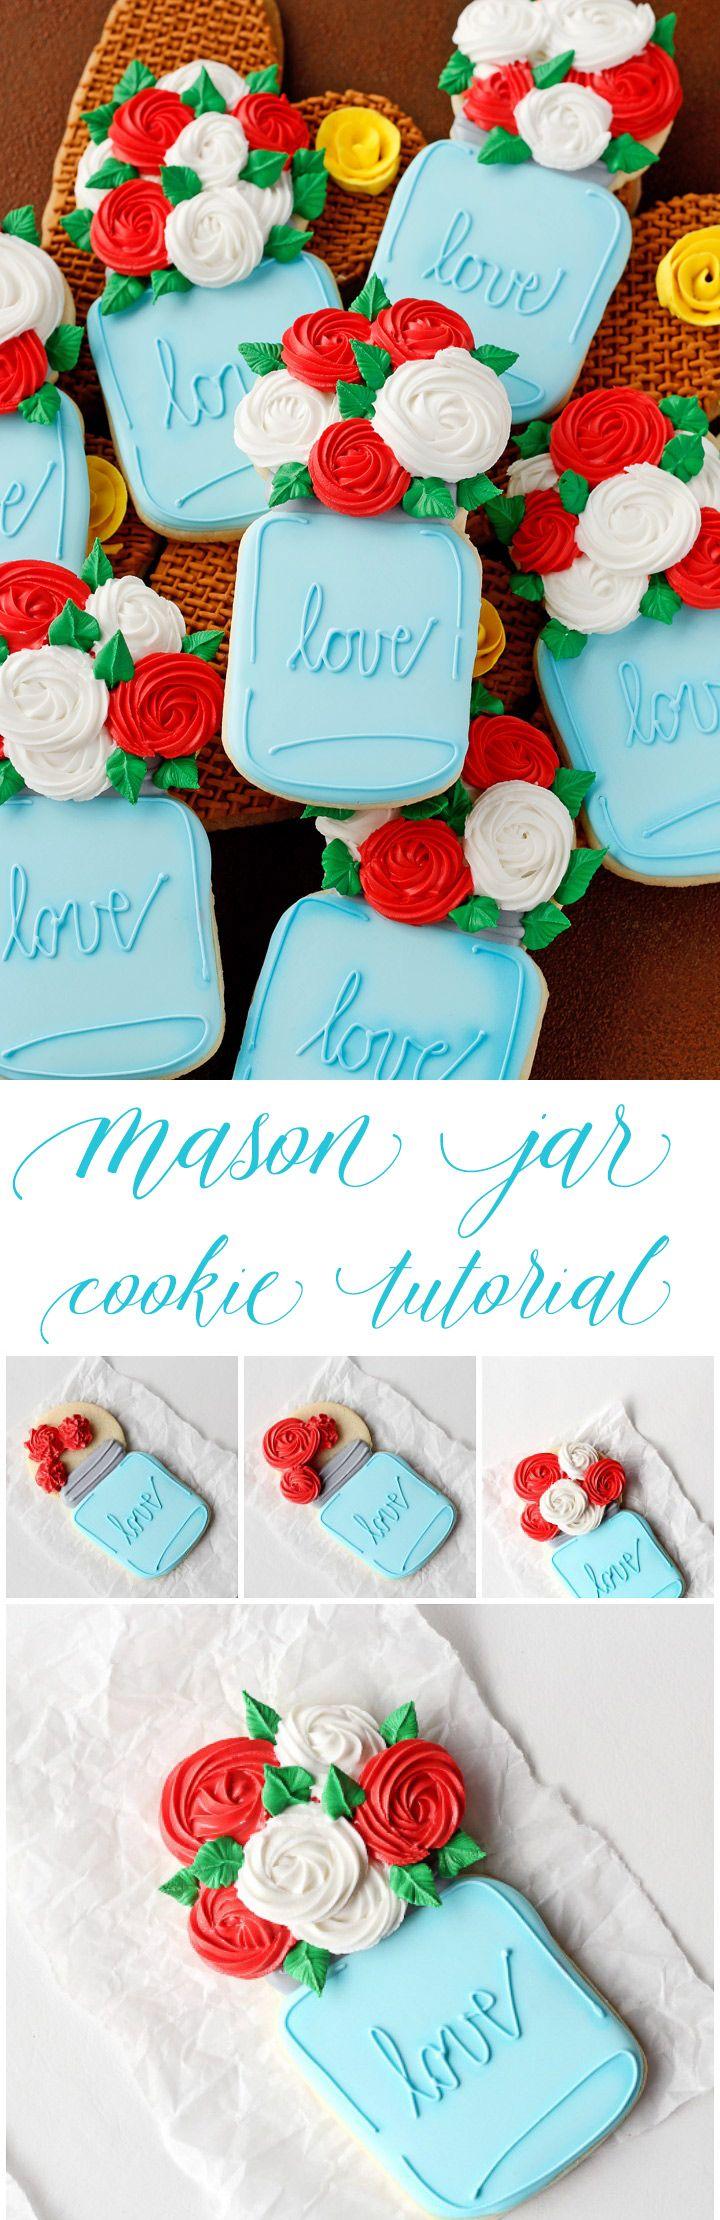 How to Make Mason Jar Cookies with Video Mason jar